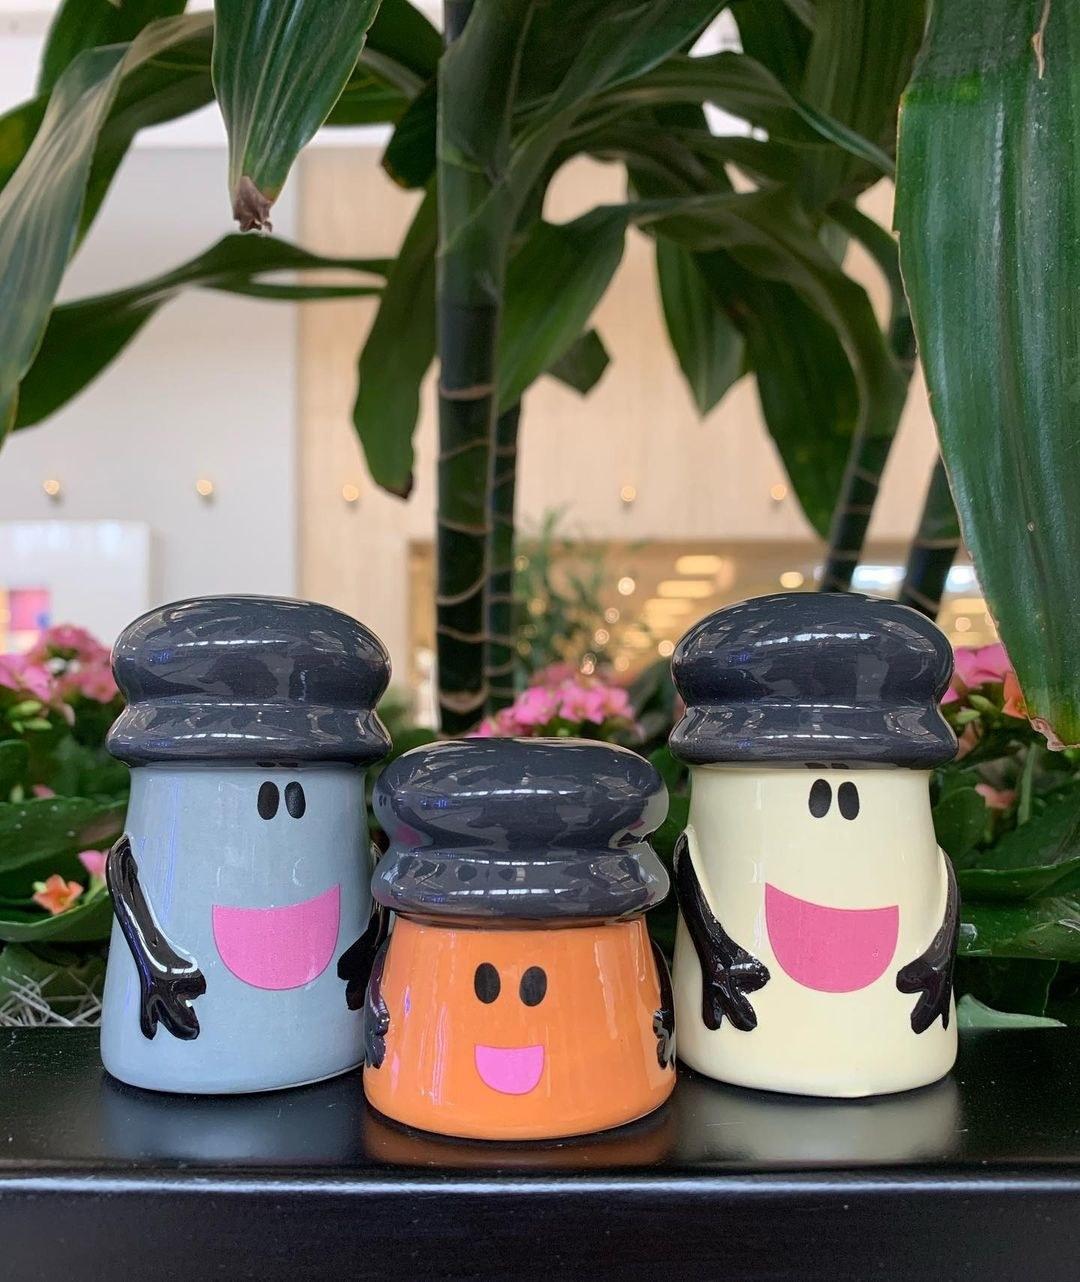 Blue's Clues-themed salt and pepper shaker set